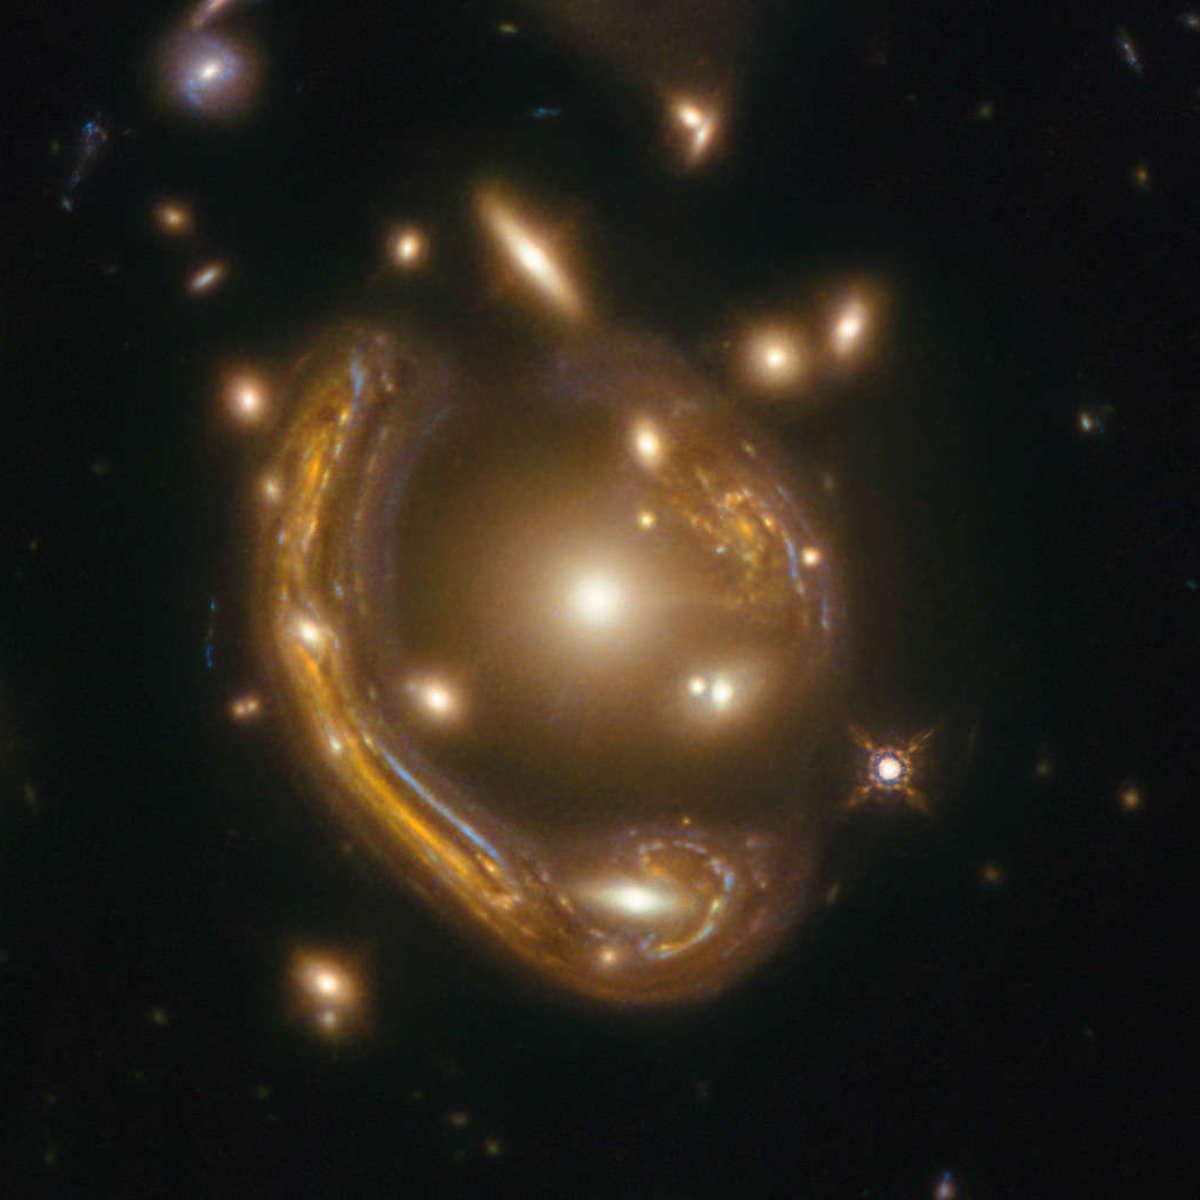 Phil Plait Bad Astronomy hst_moltenring_detail